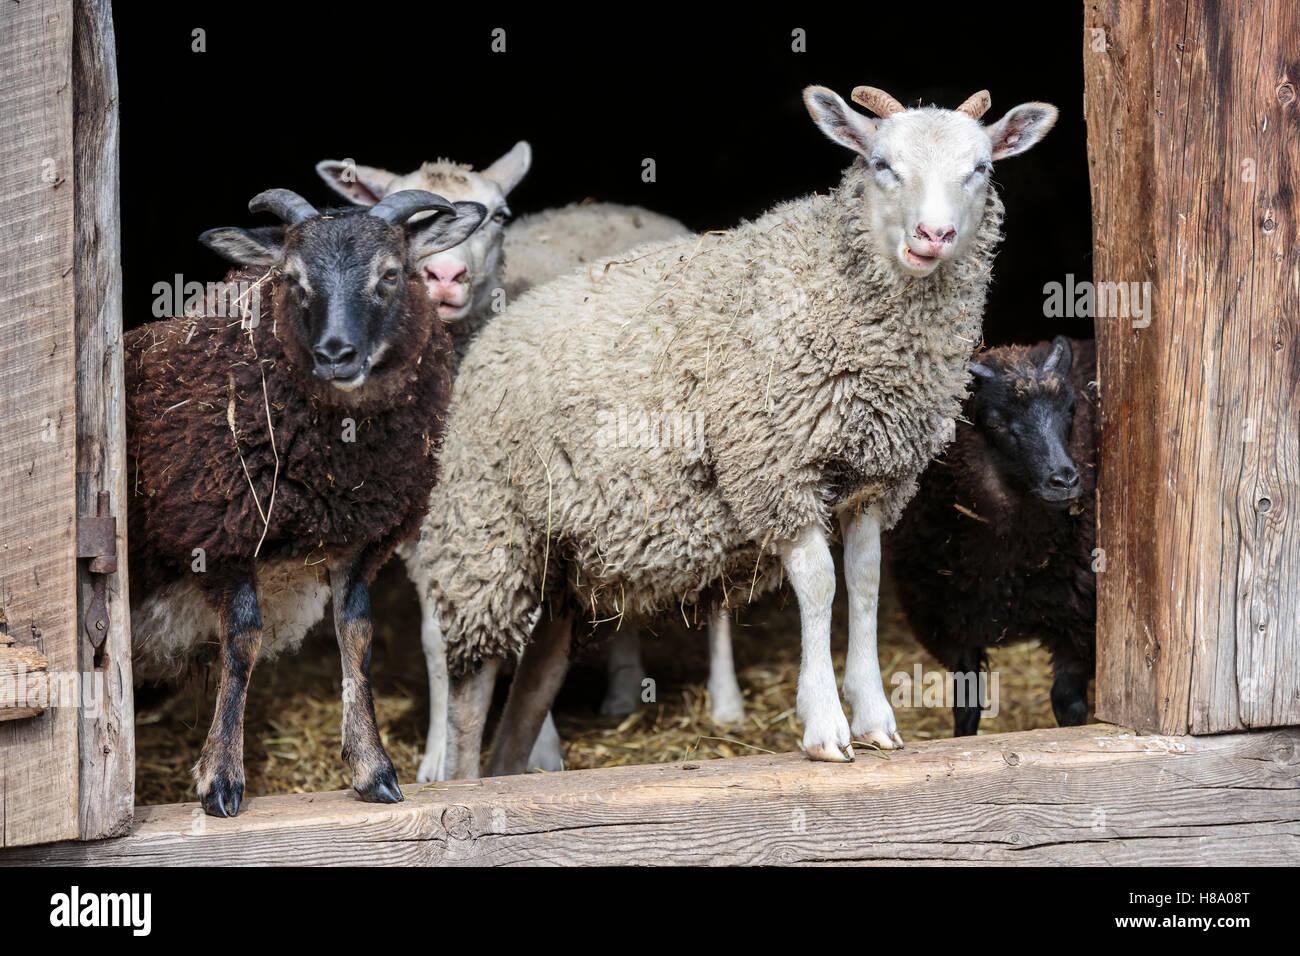 Domestic Sheep in a sheep barn, Ontario, Canada. - Stock Image